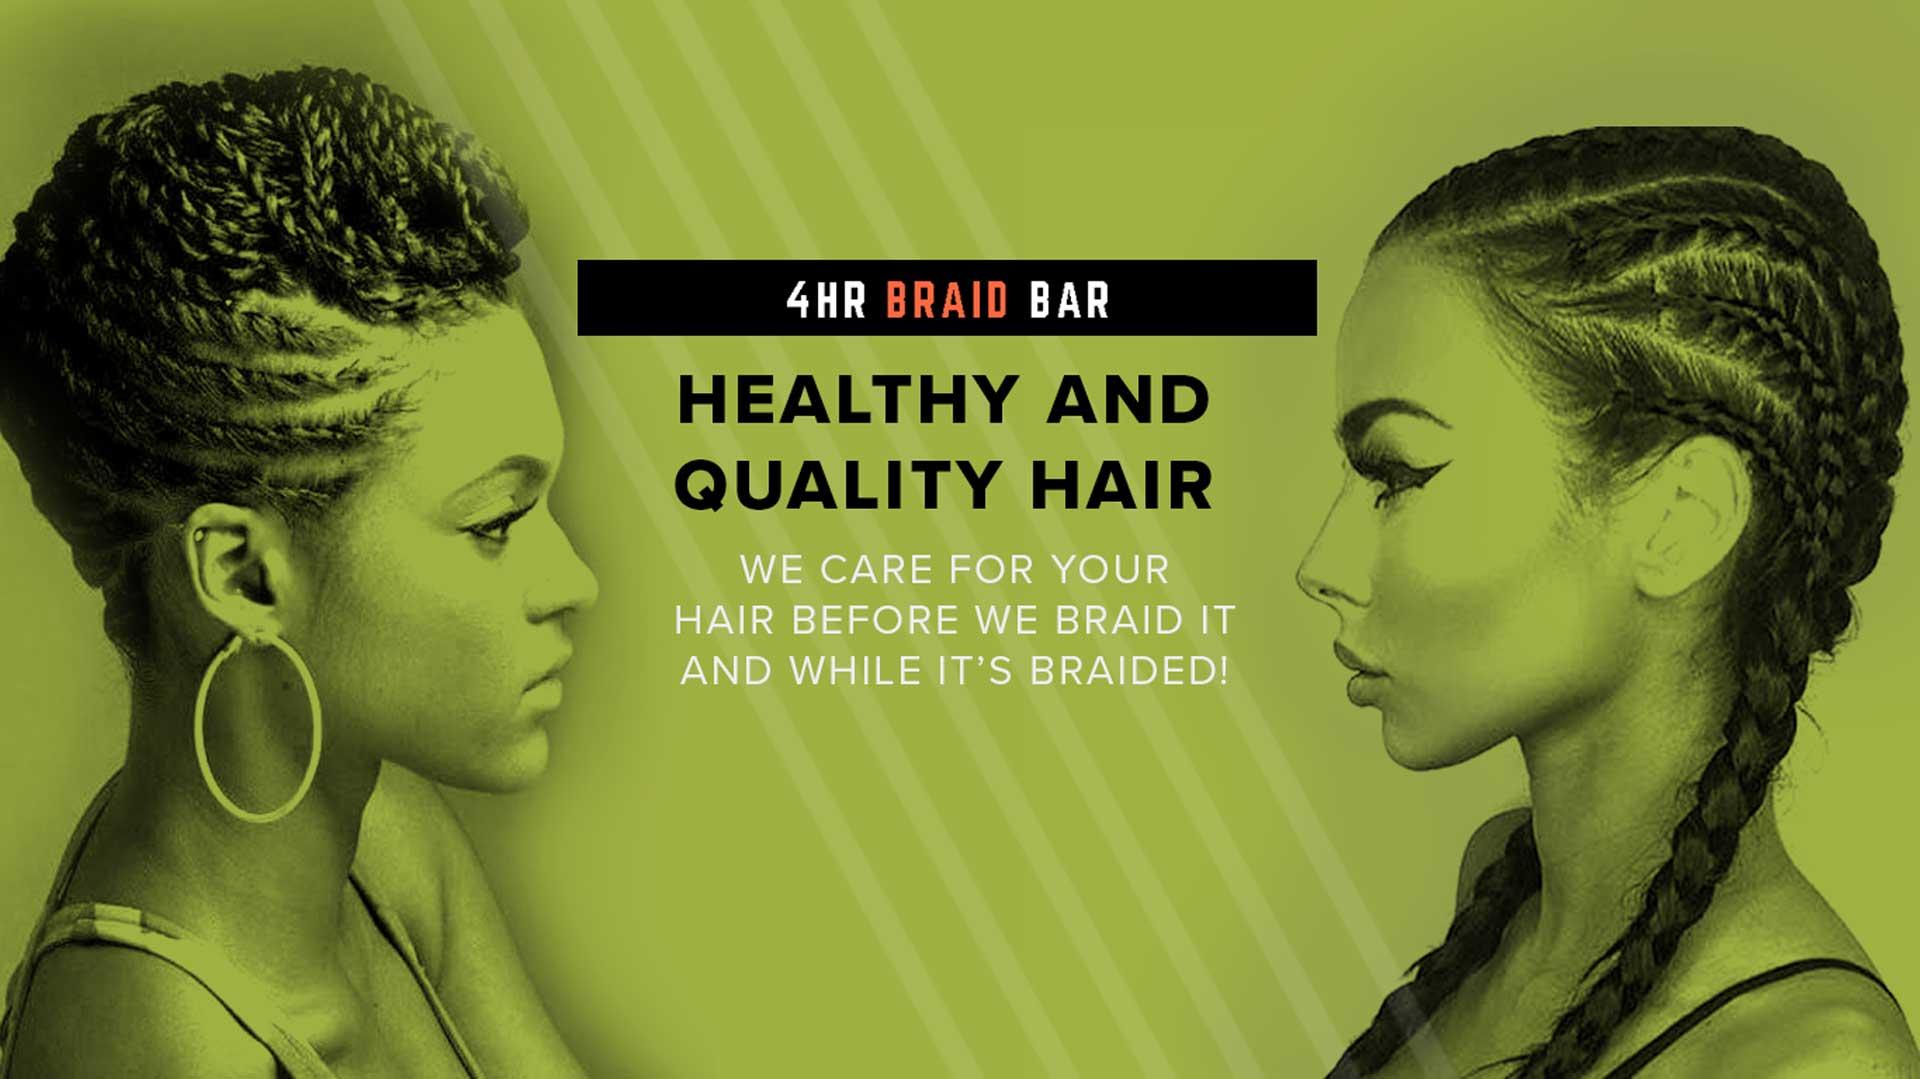 4HR Braid Bar Healthy and Quality Hair